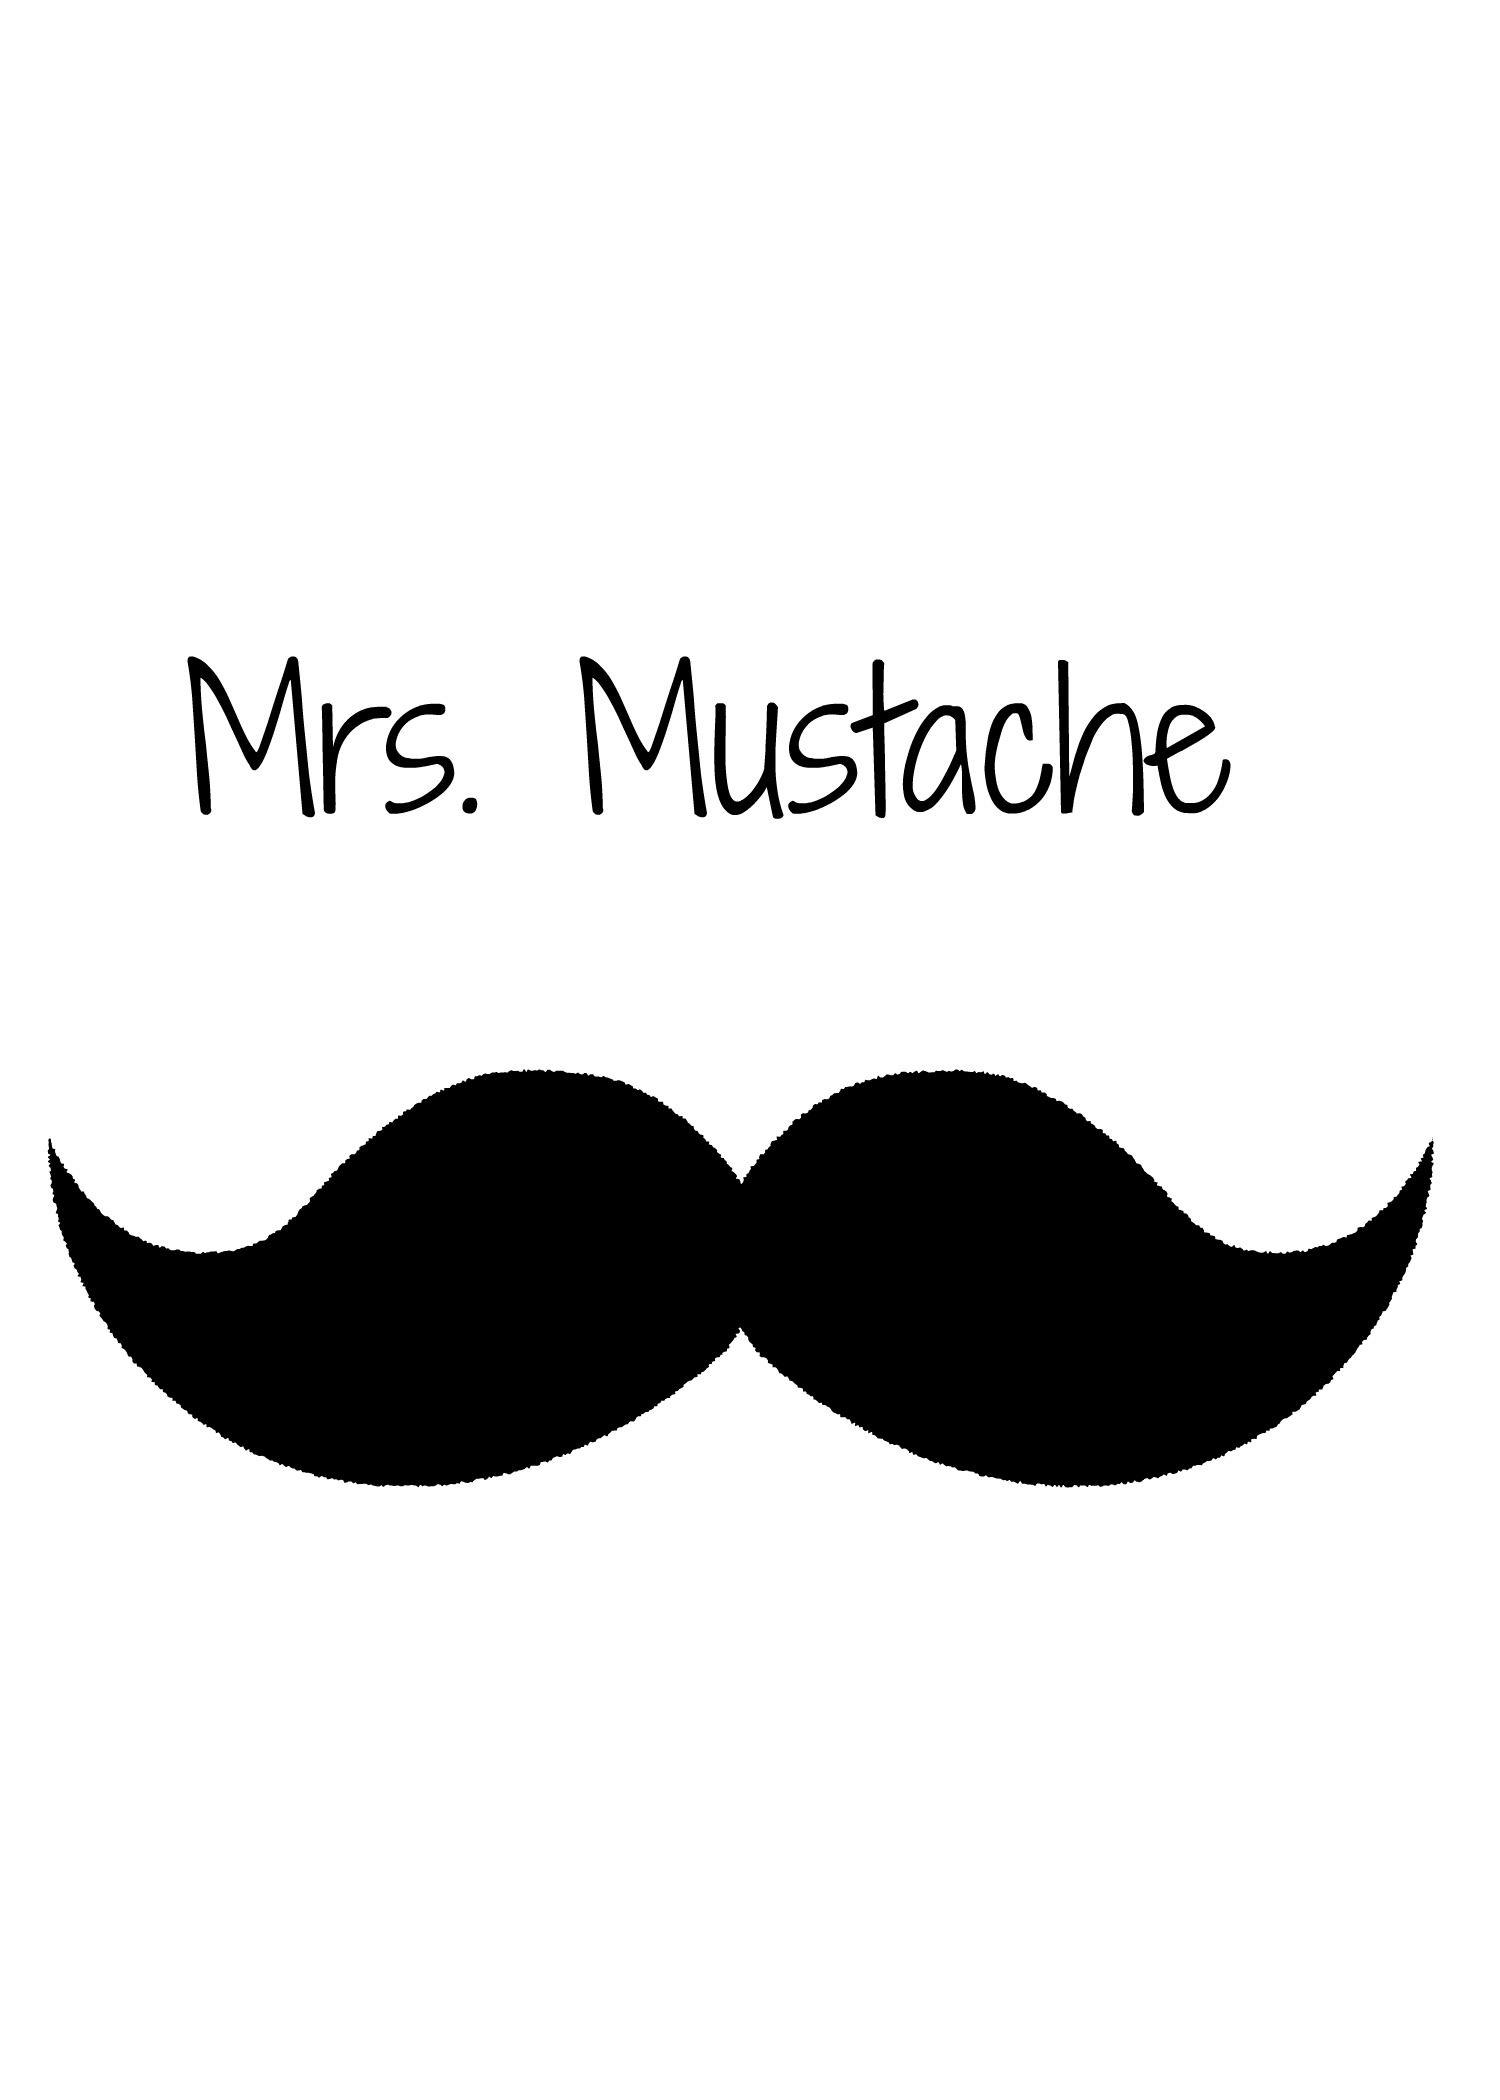 mrs. mustache